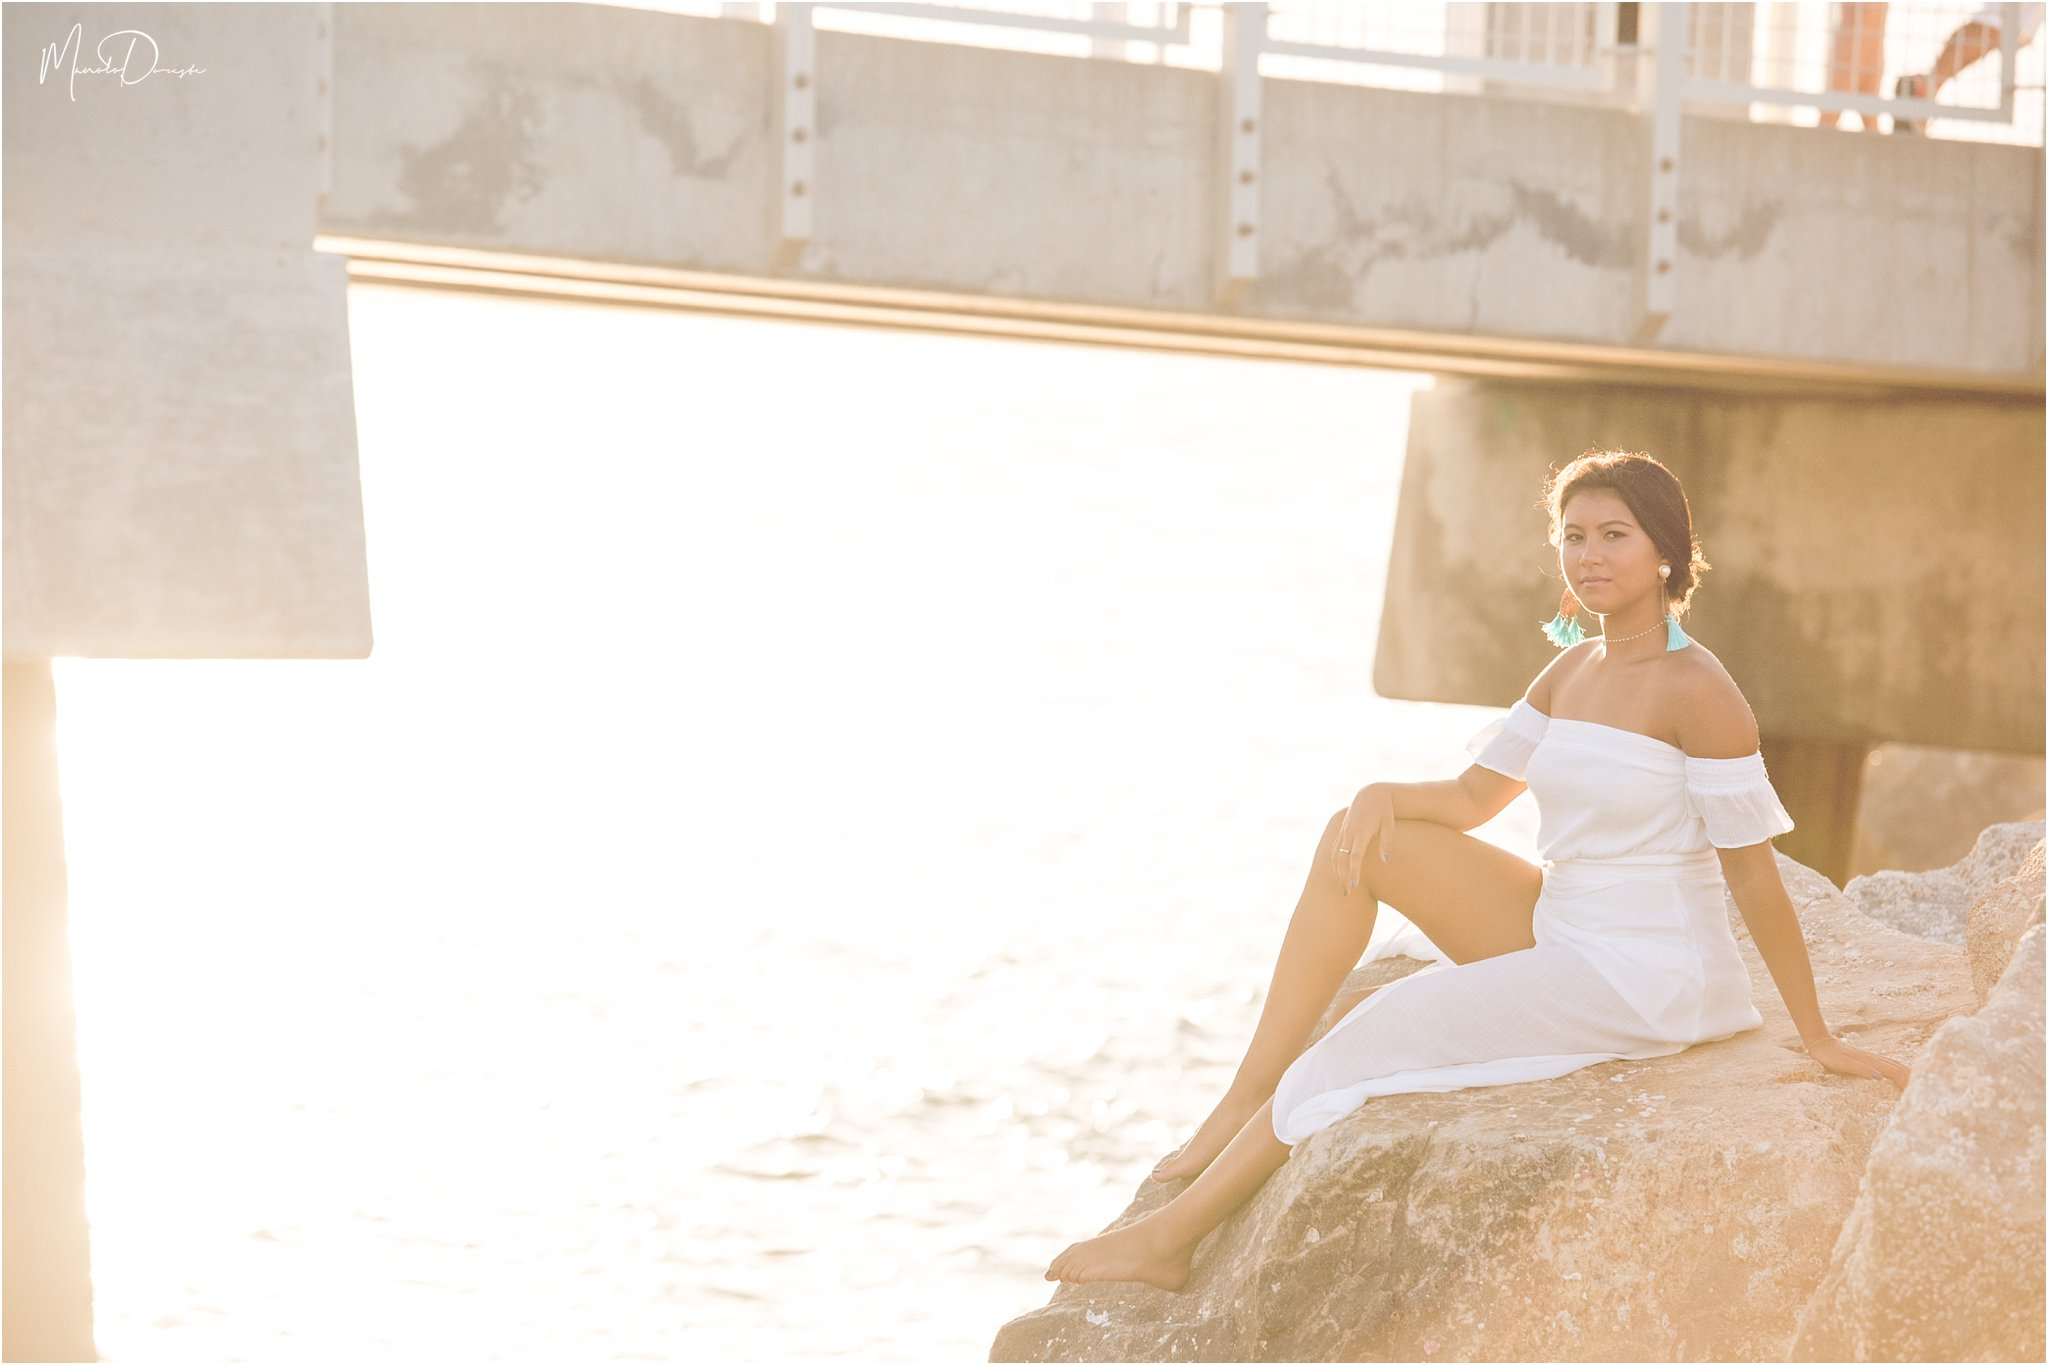 0240_ManoloDoreste_InFocusStudios_Wedding_Family_Photography_Miami_MiamiPhotographer.jpg